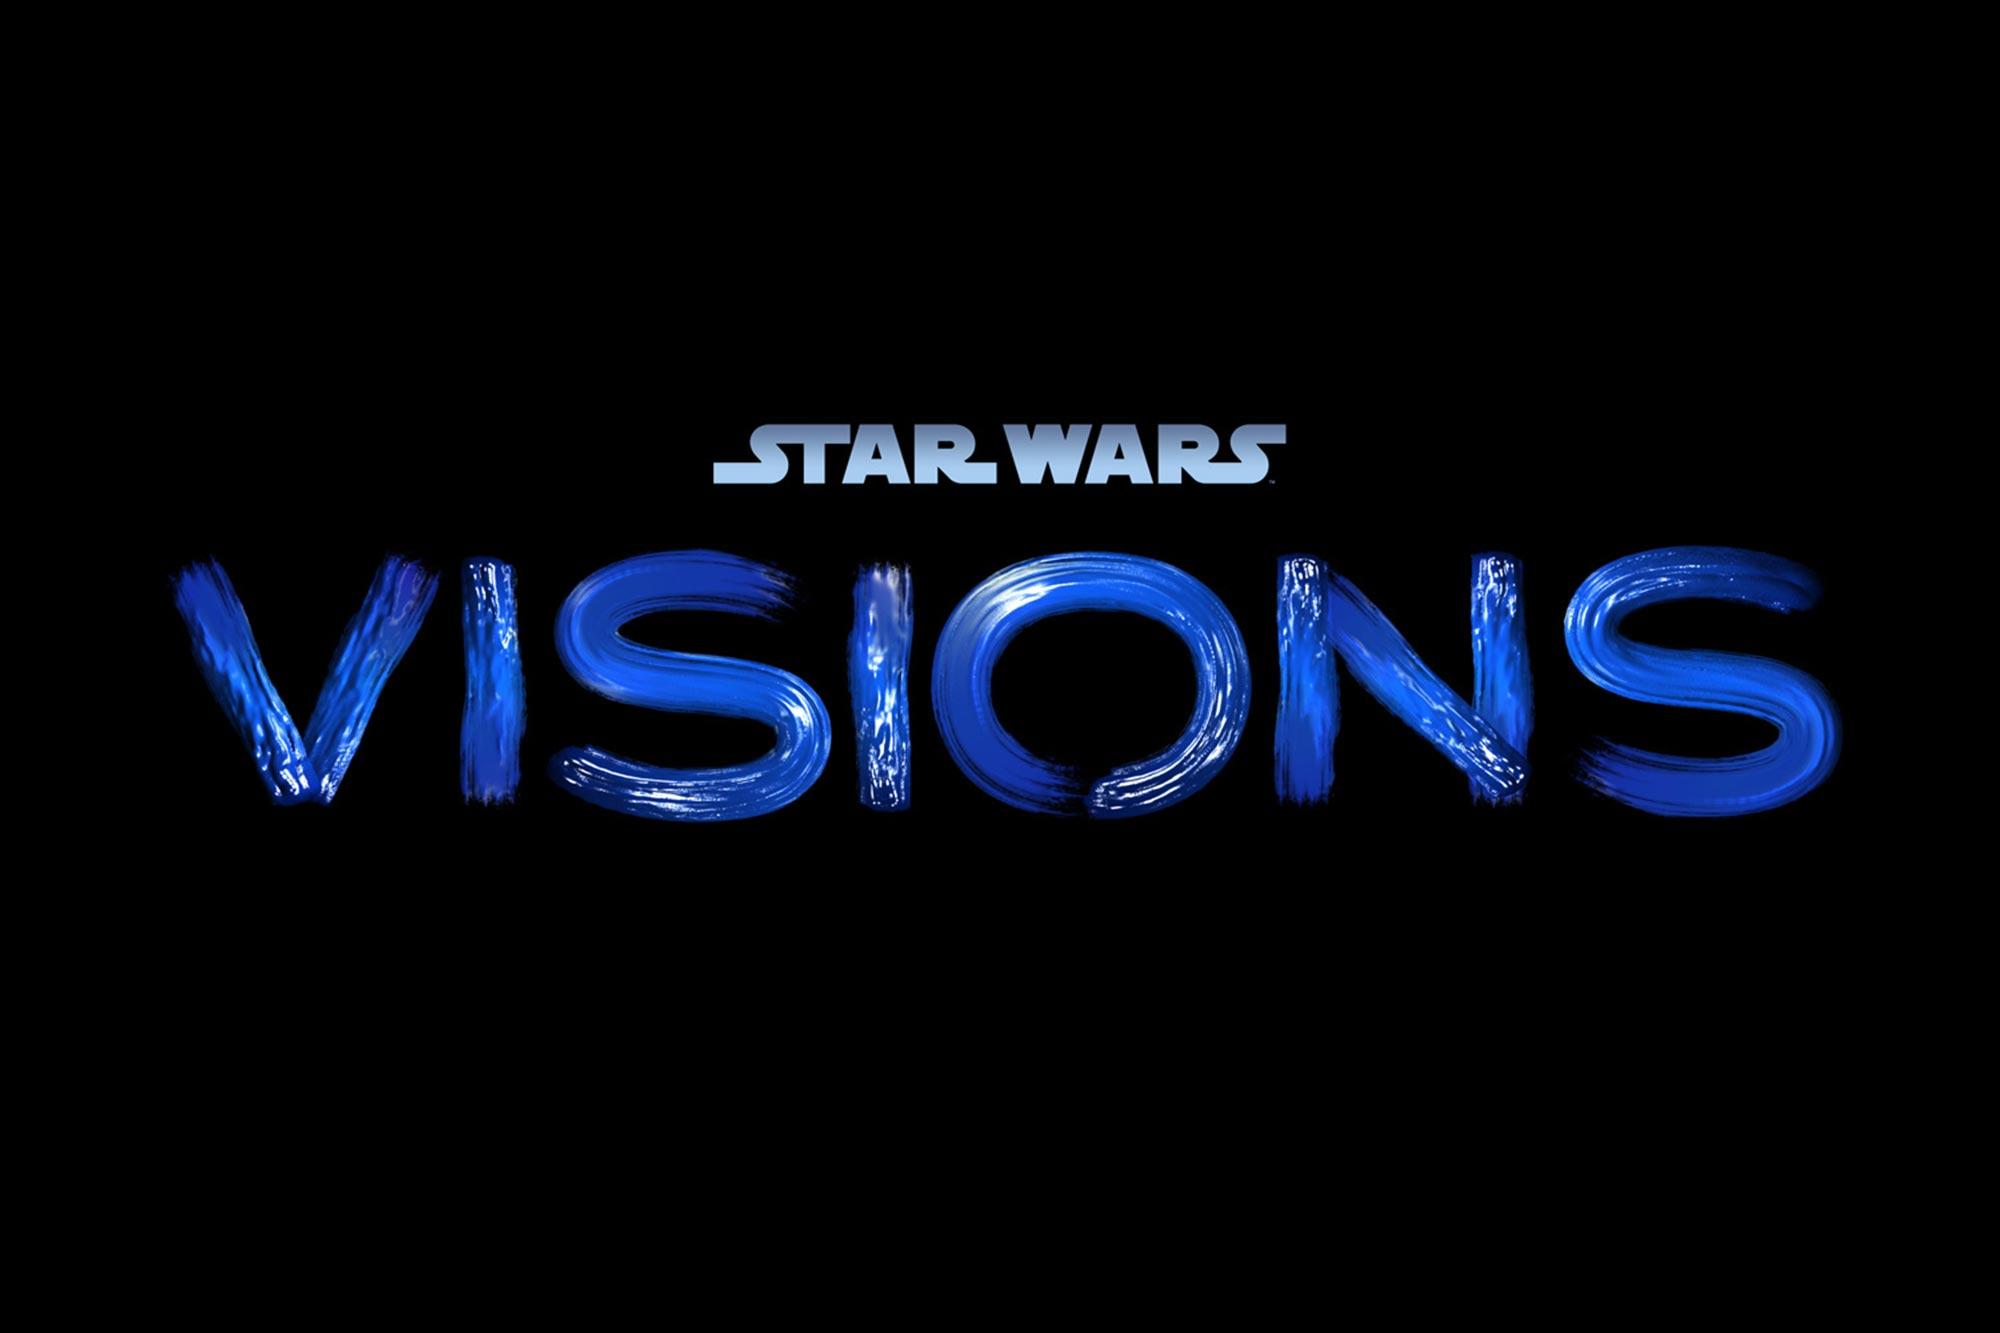 Star Wars Disney + shows